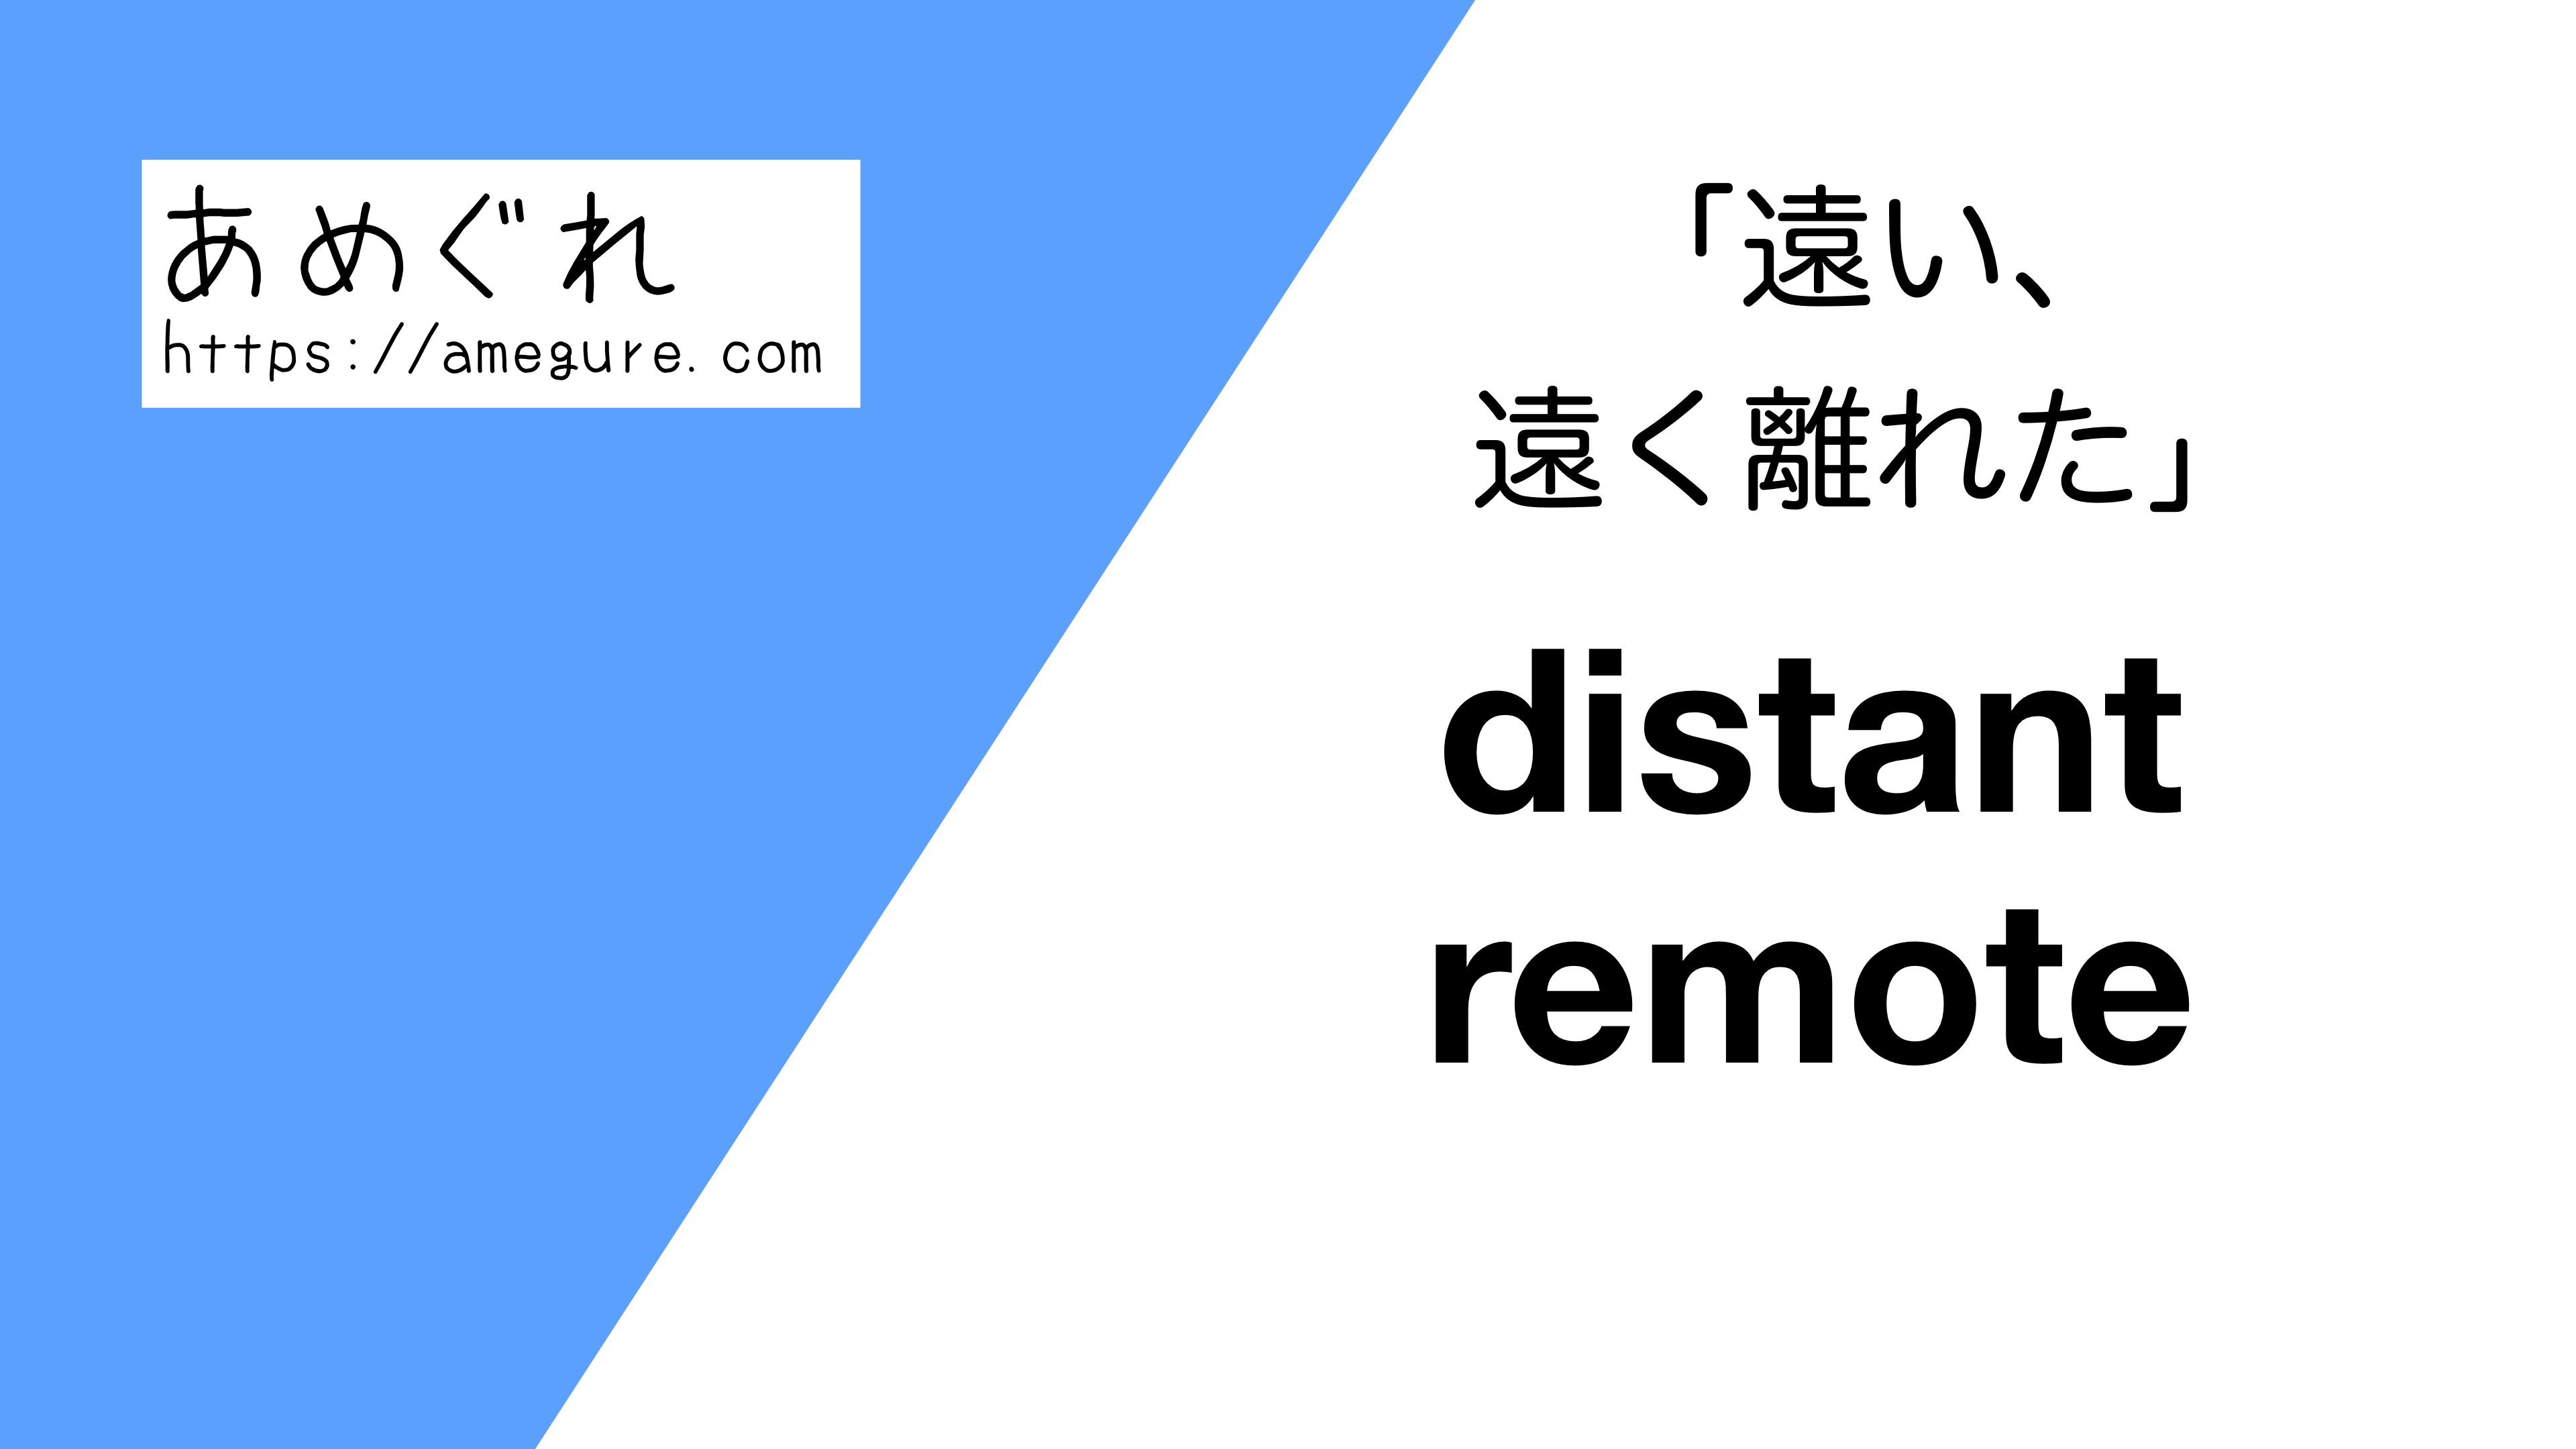 distant-remote違い